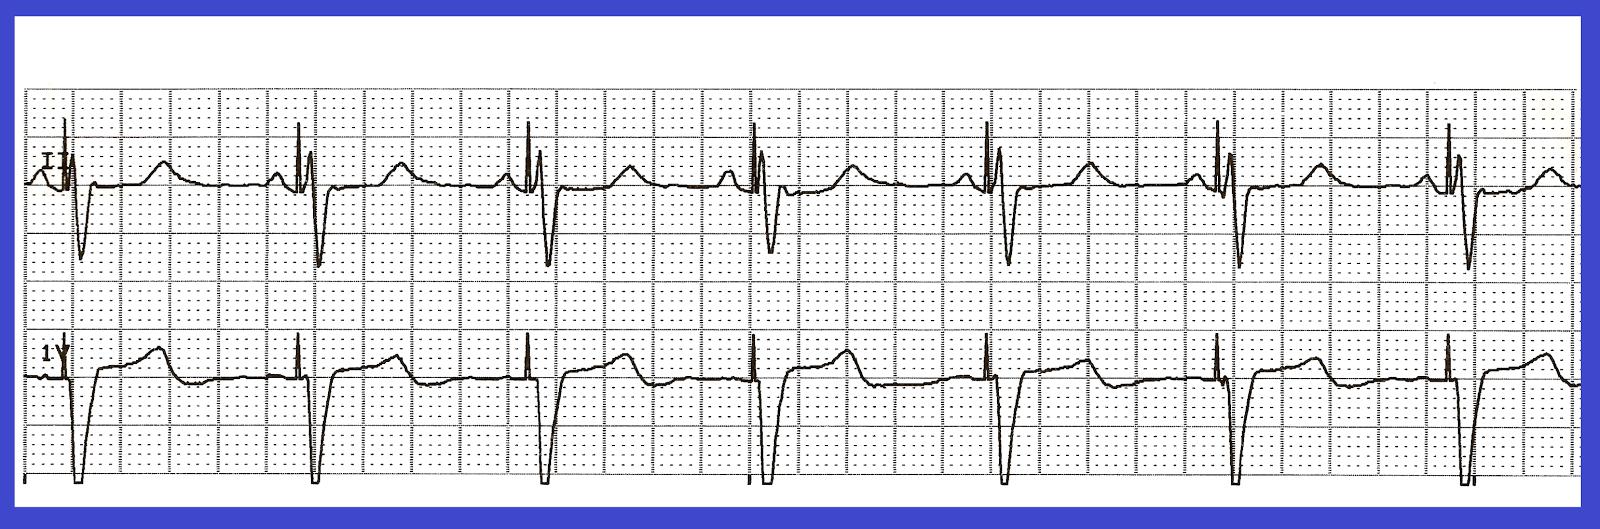 Polymorphic Ventricular Tachycardia   www.imgkid.com - The ...